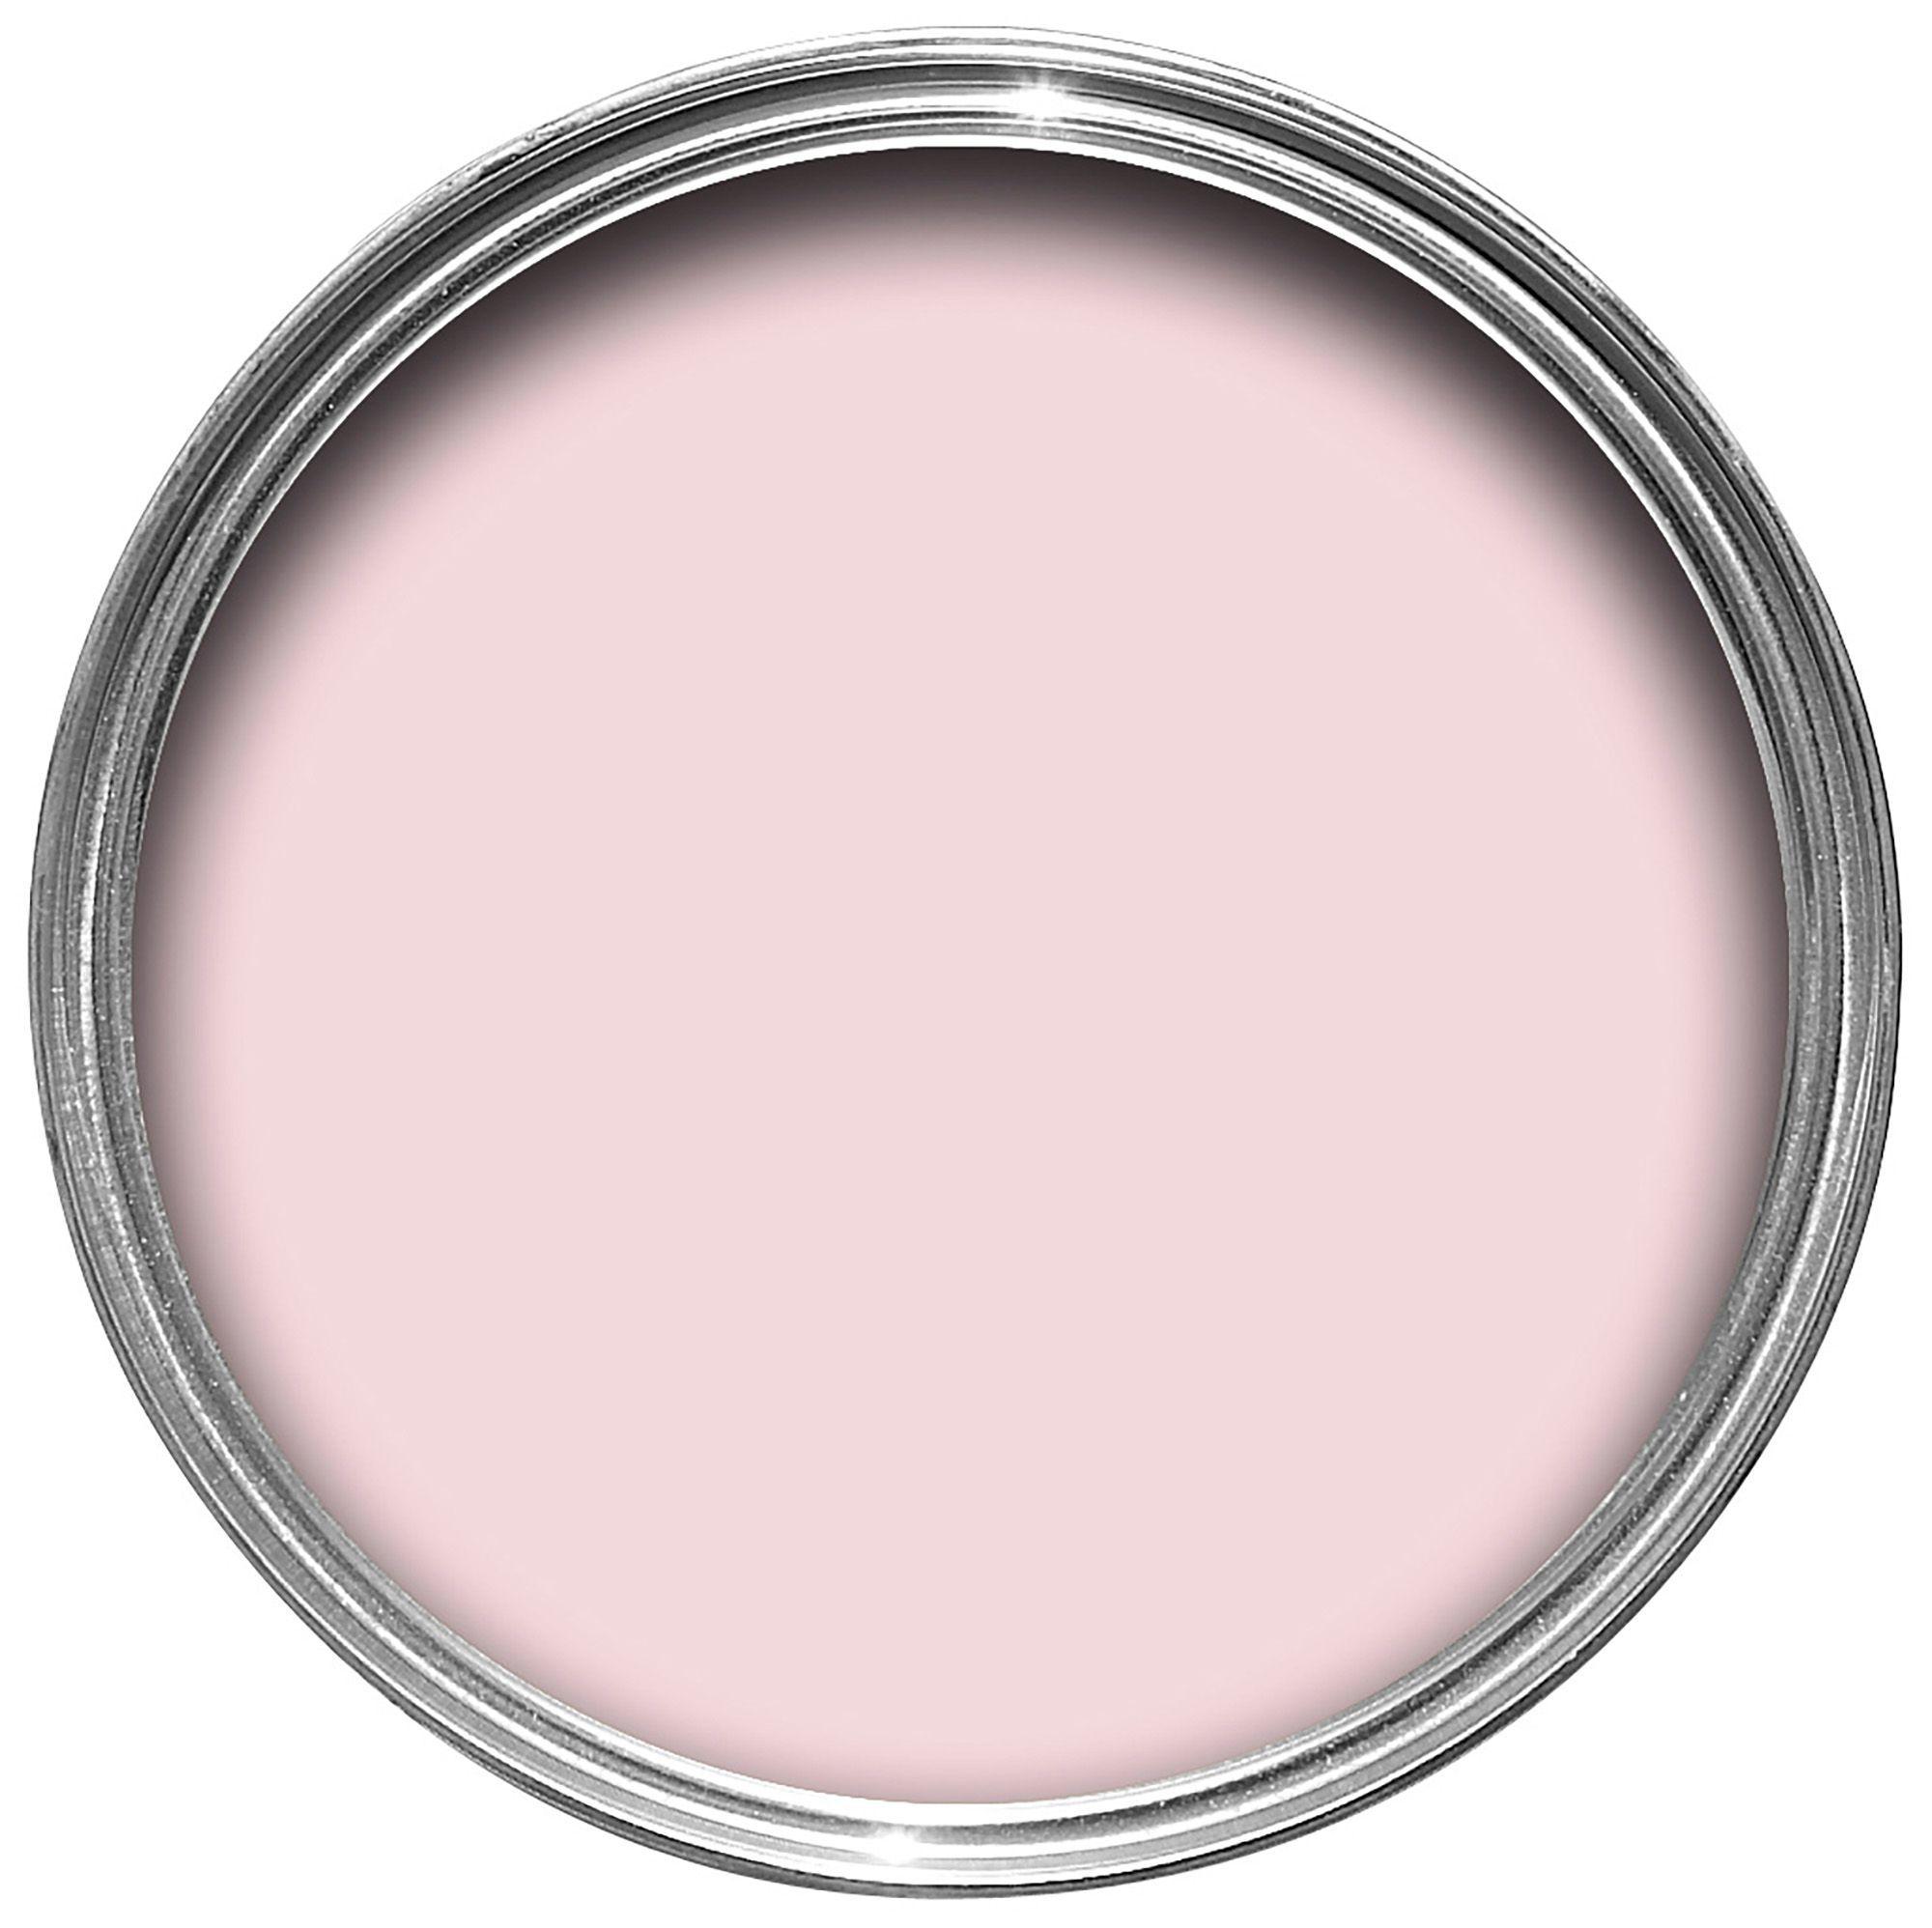 Dulux Endurance Sorbet Matt Emulsion Paint 50ml Tester Pot